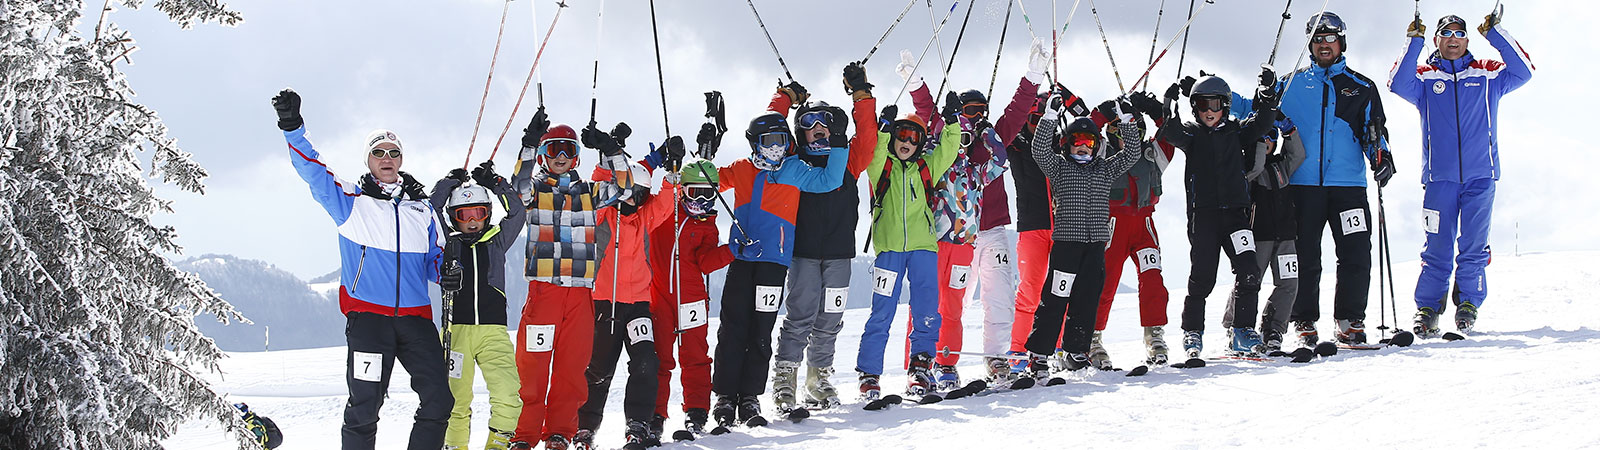 ski-en-club-cest-facile